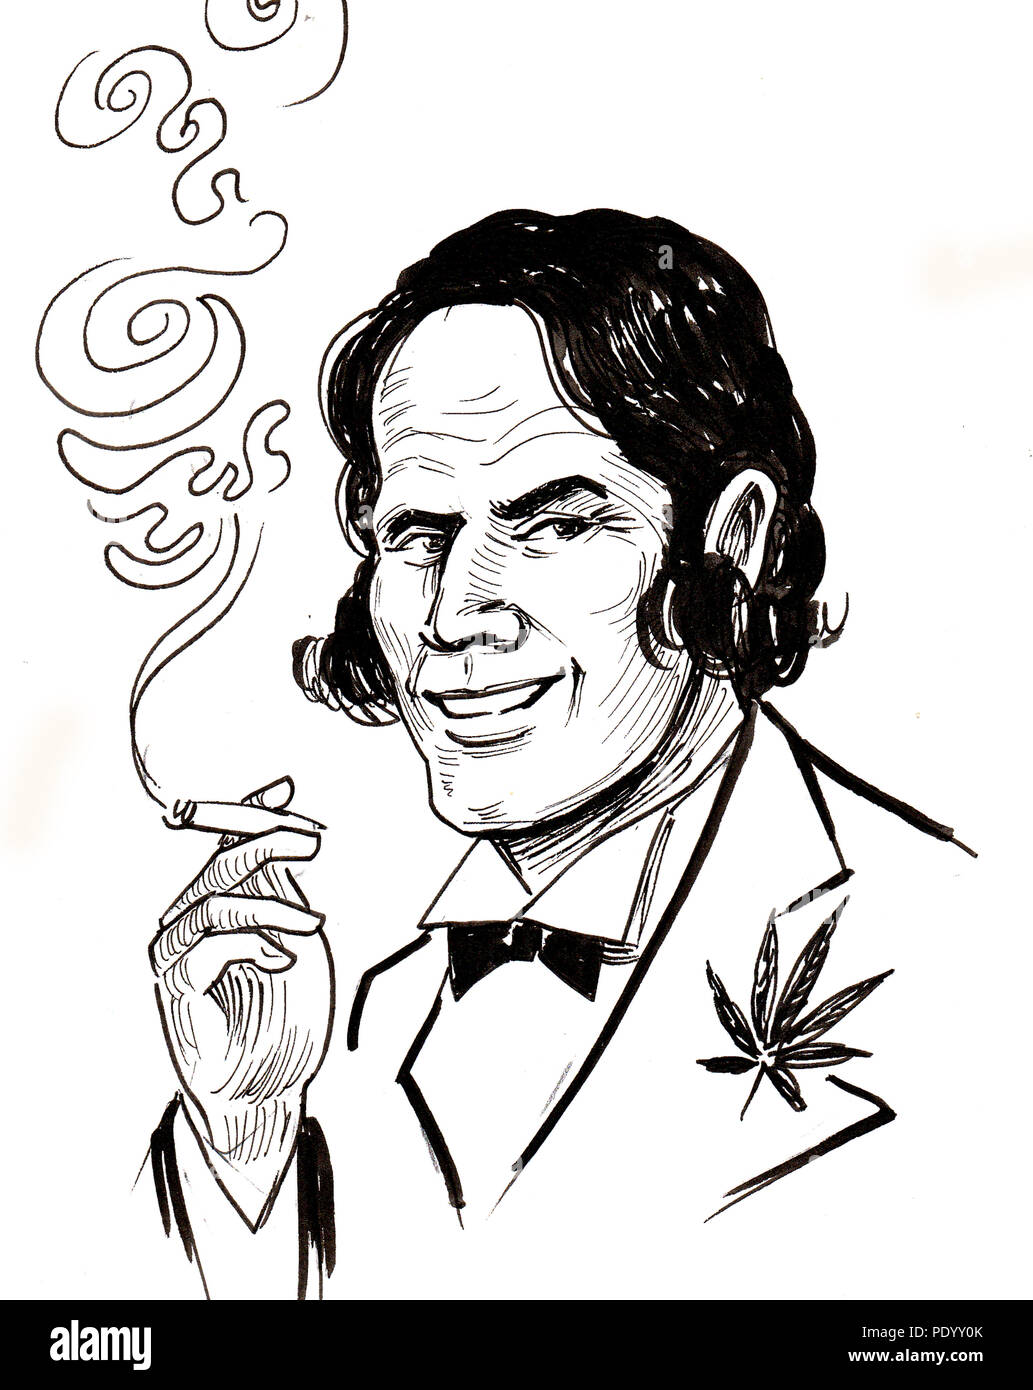 Cartoon Marijuana Cigarette High Resolution Stock Photography And